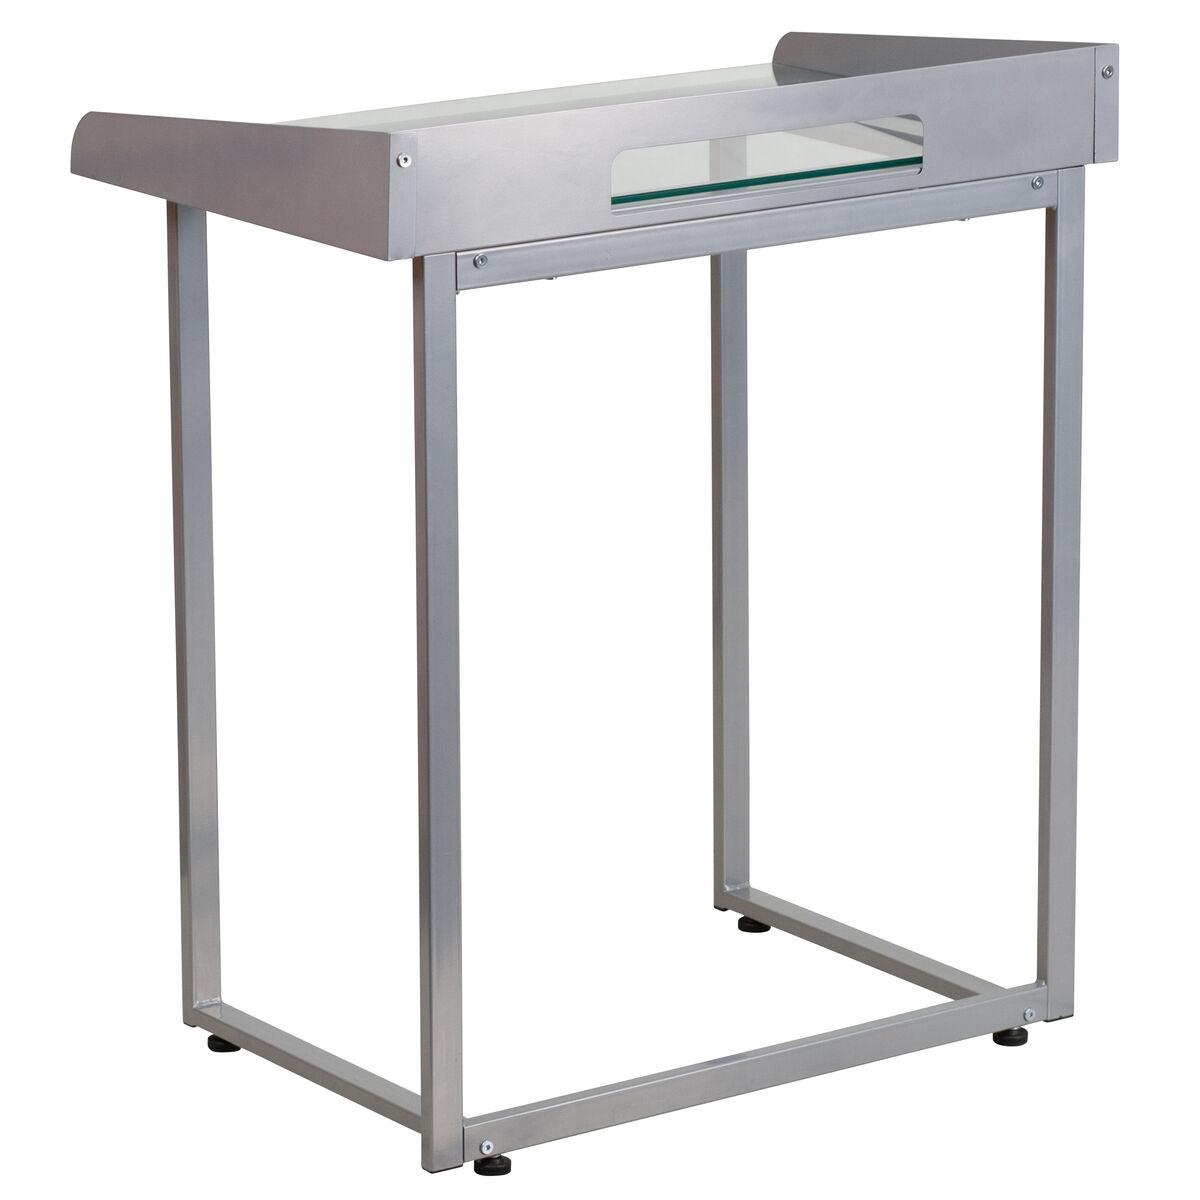 Glass Top Desk NAN-YLCD1234-GG | Bizchair.com